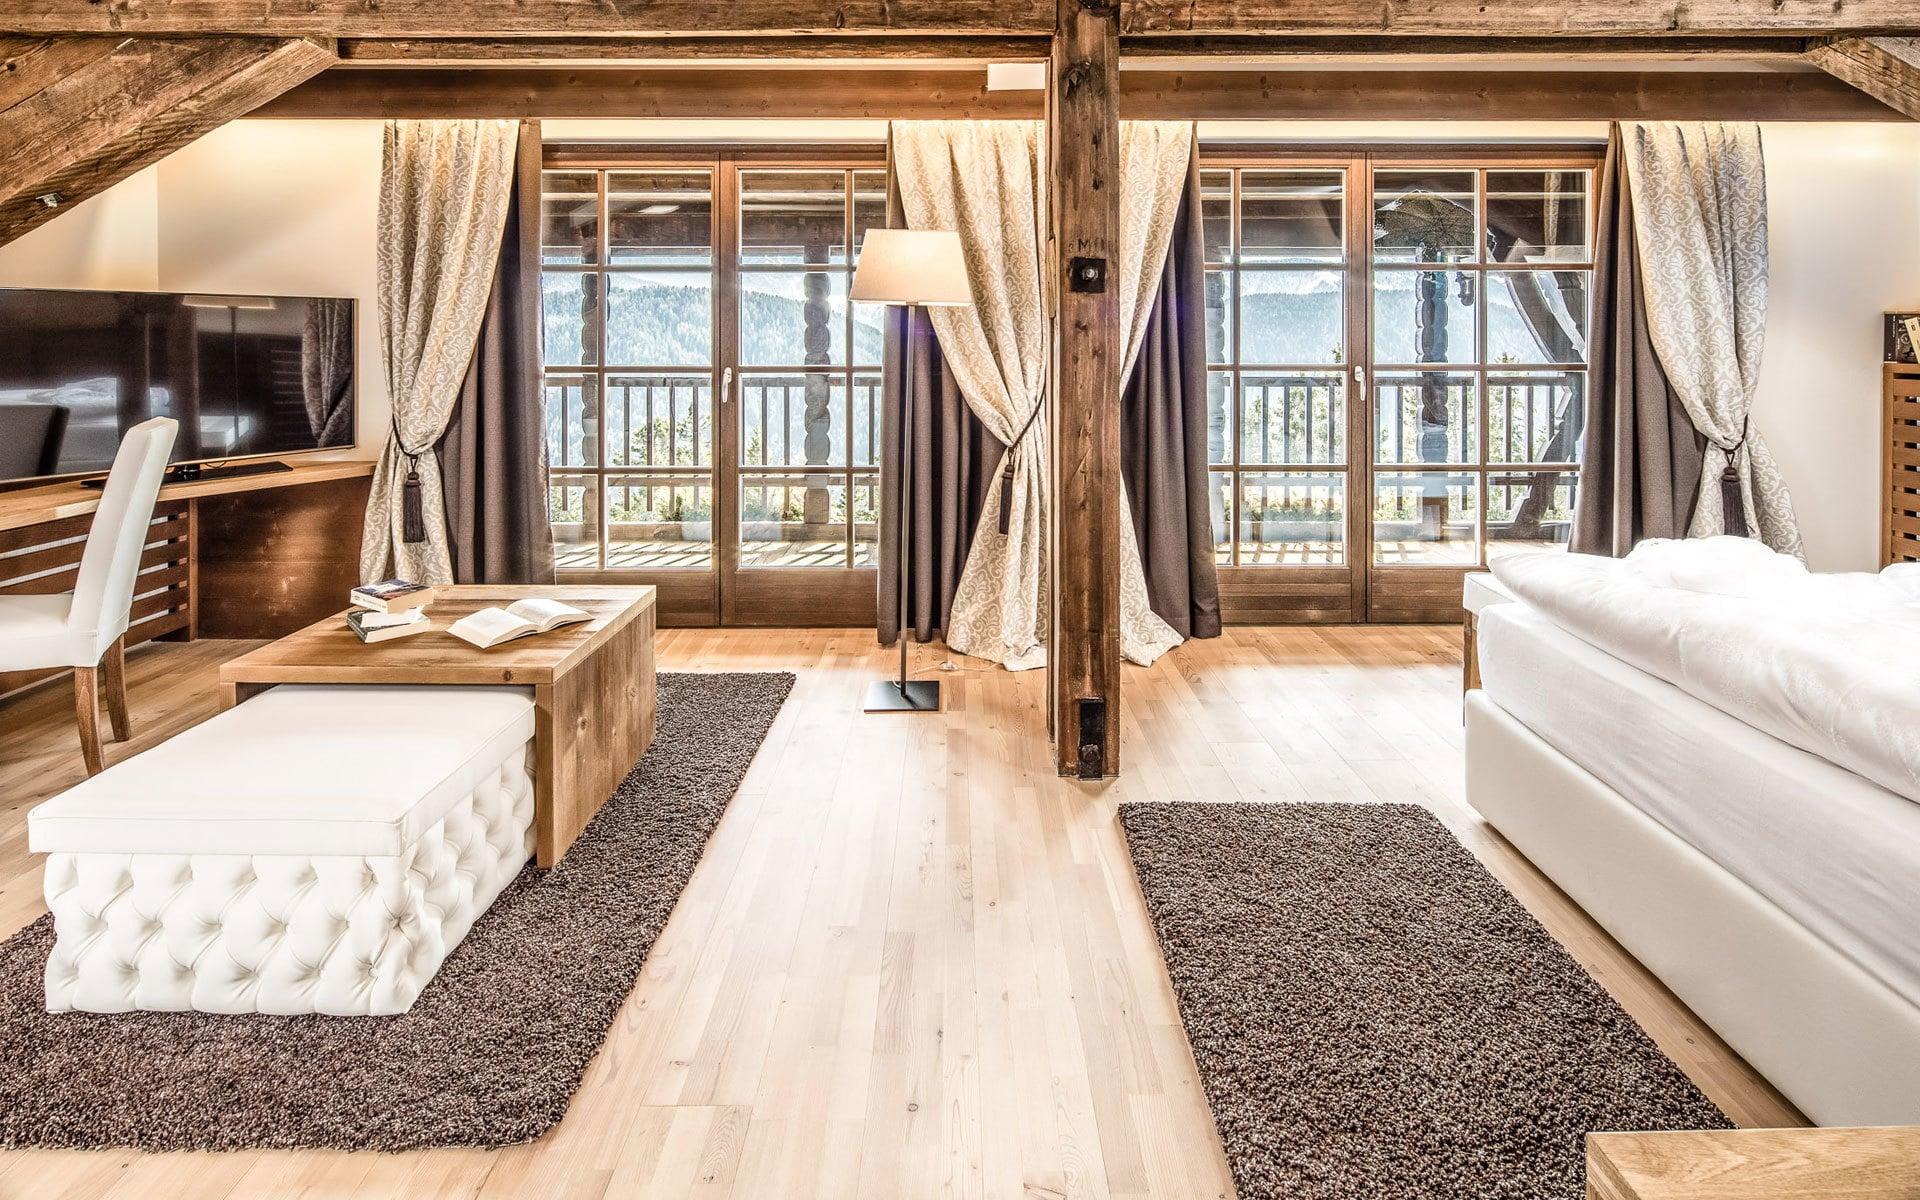 Hotel Rosalpina – The Dolomites Hideaway